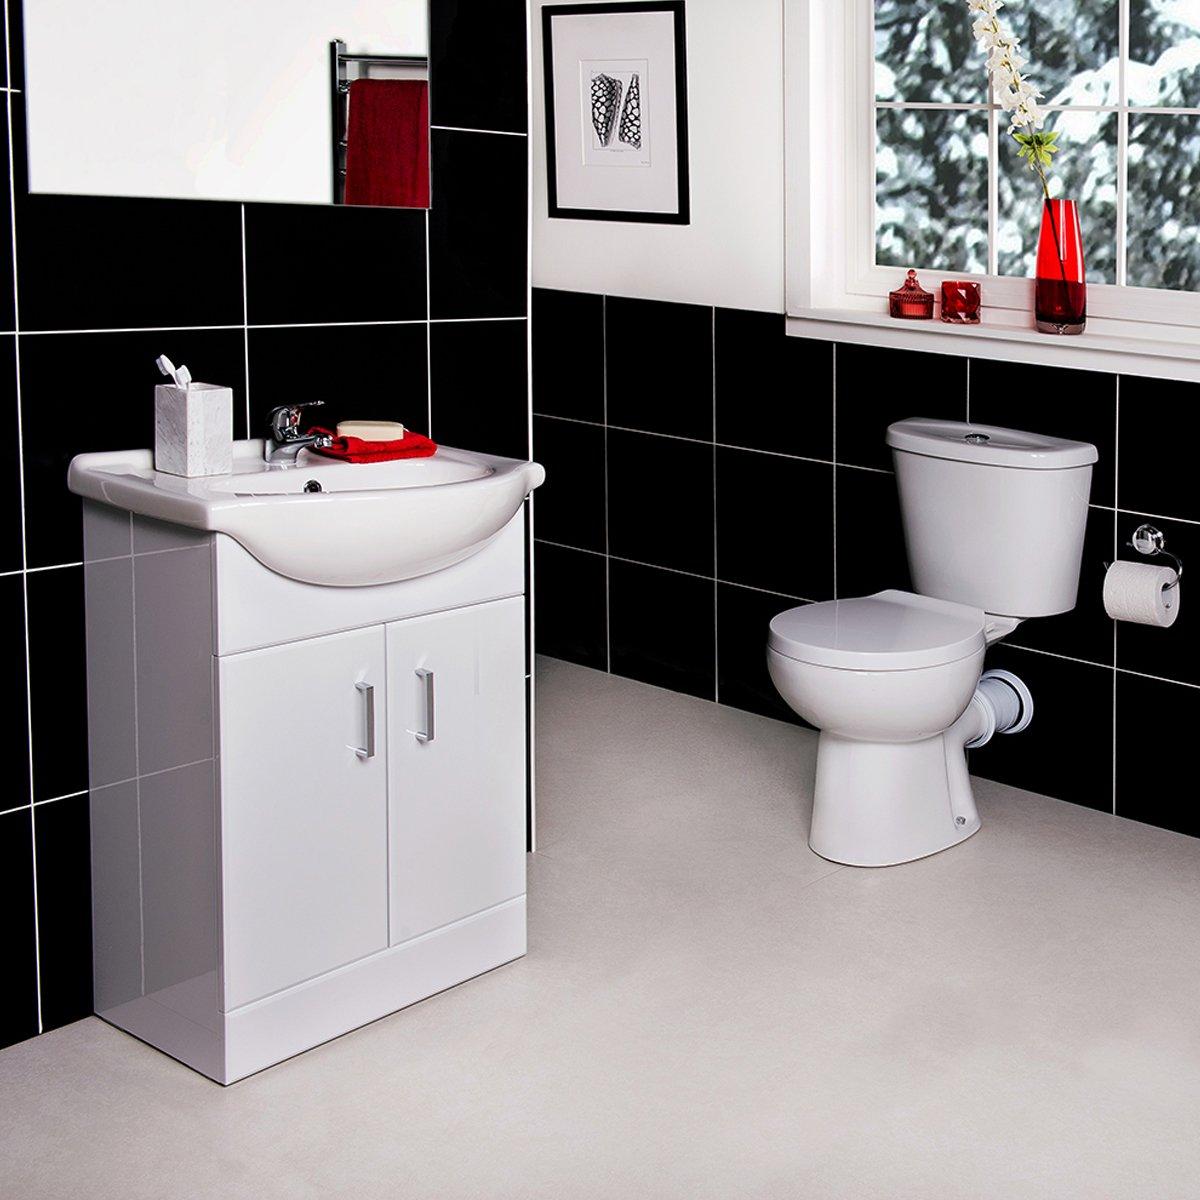 Shower Enclosure Bathroom Suites: Amazon.co.uk